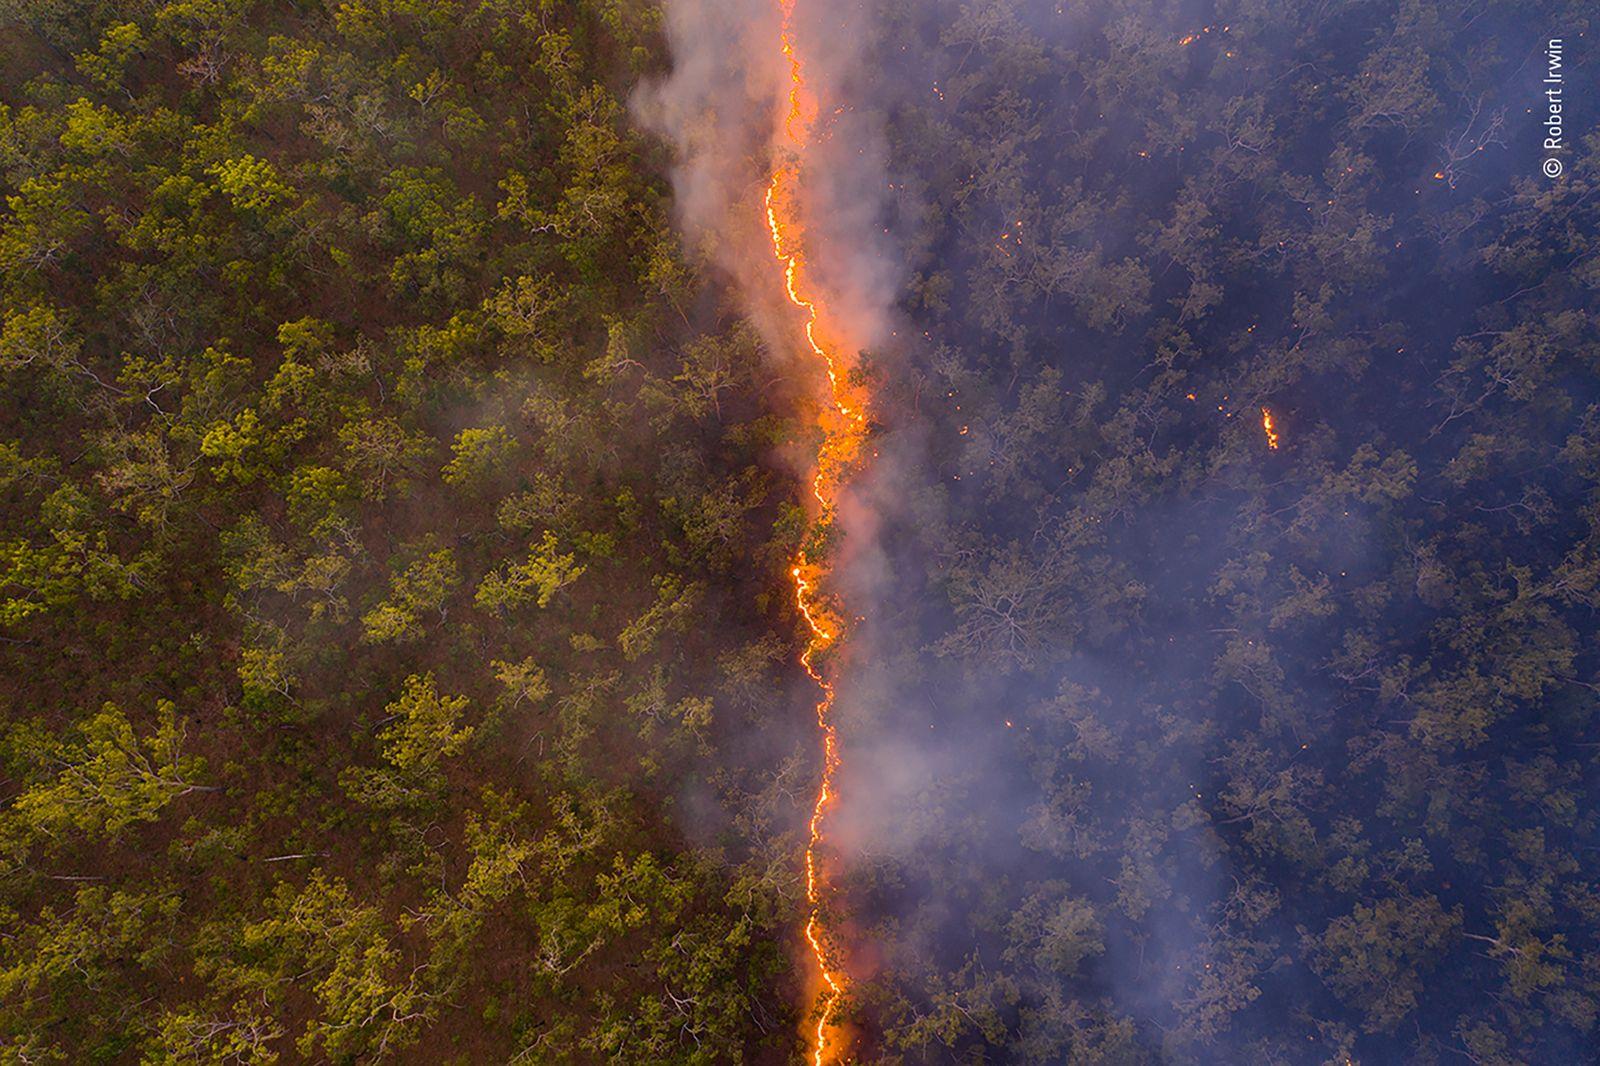 Bushfire by Robert Irwin, Australia